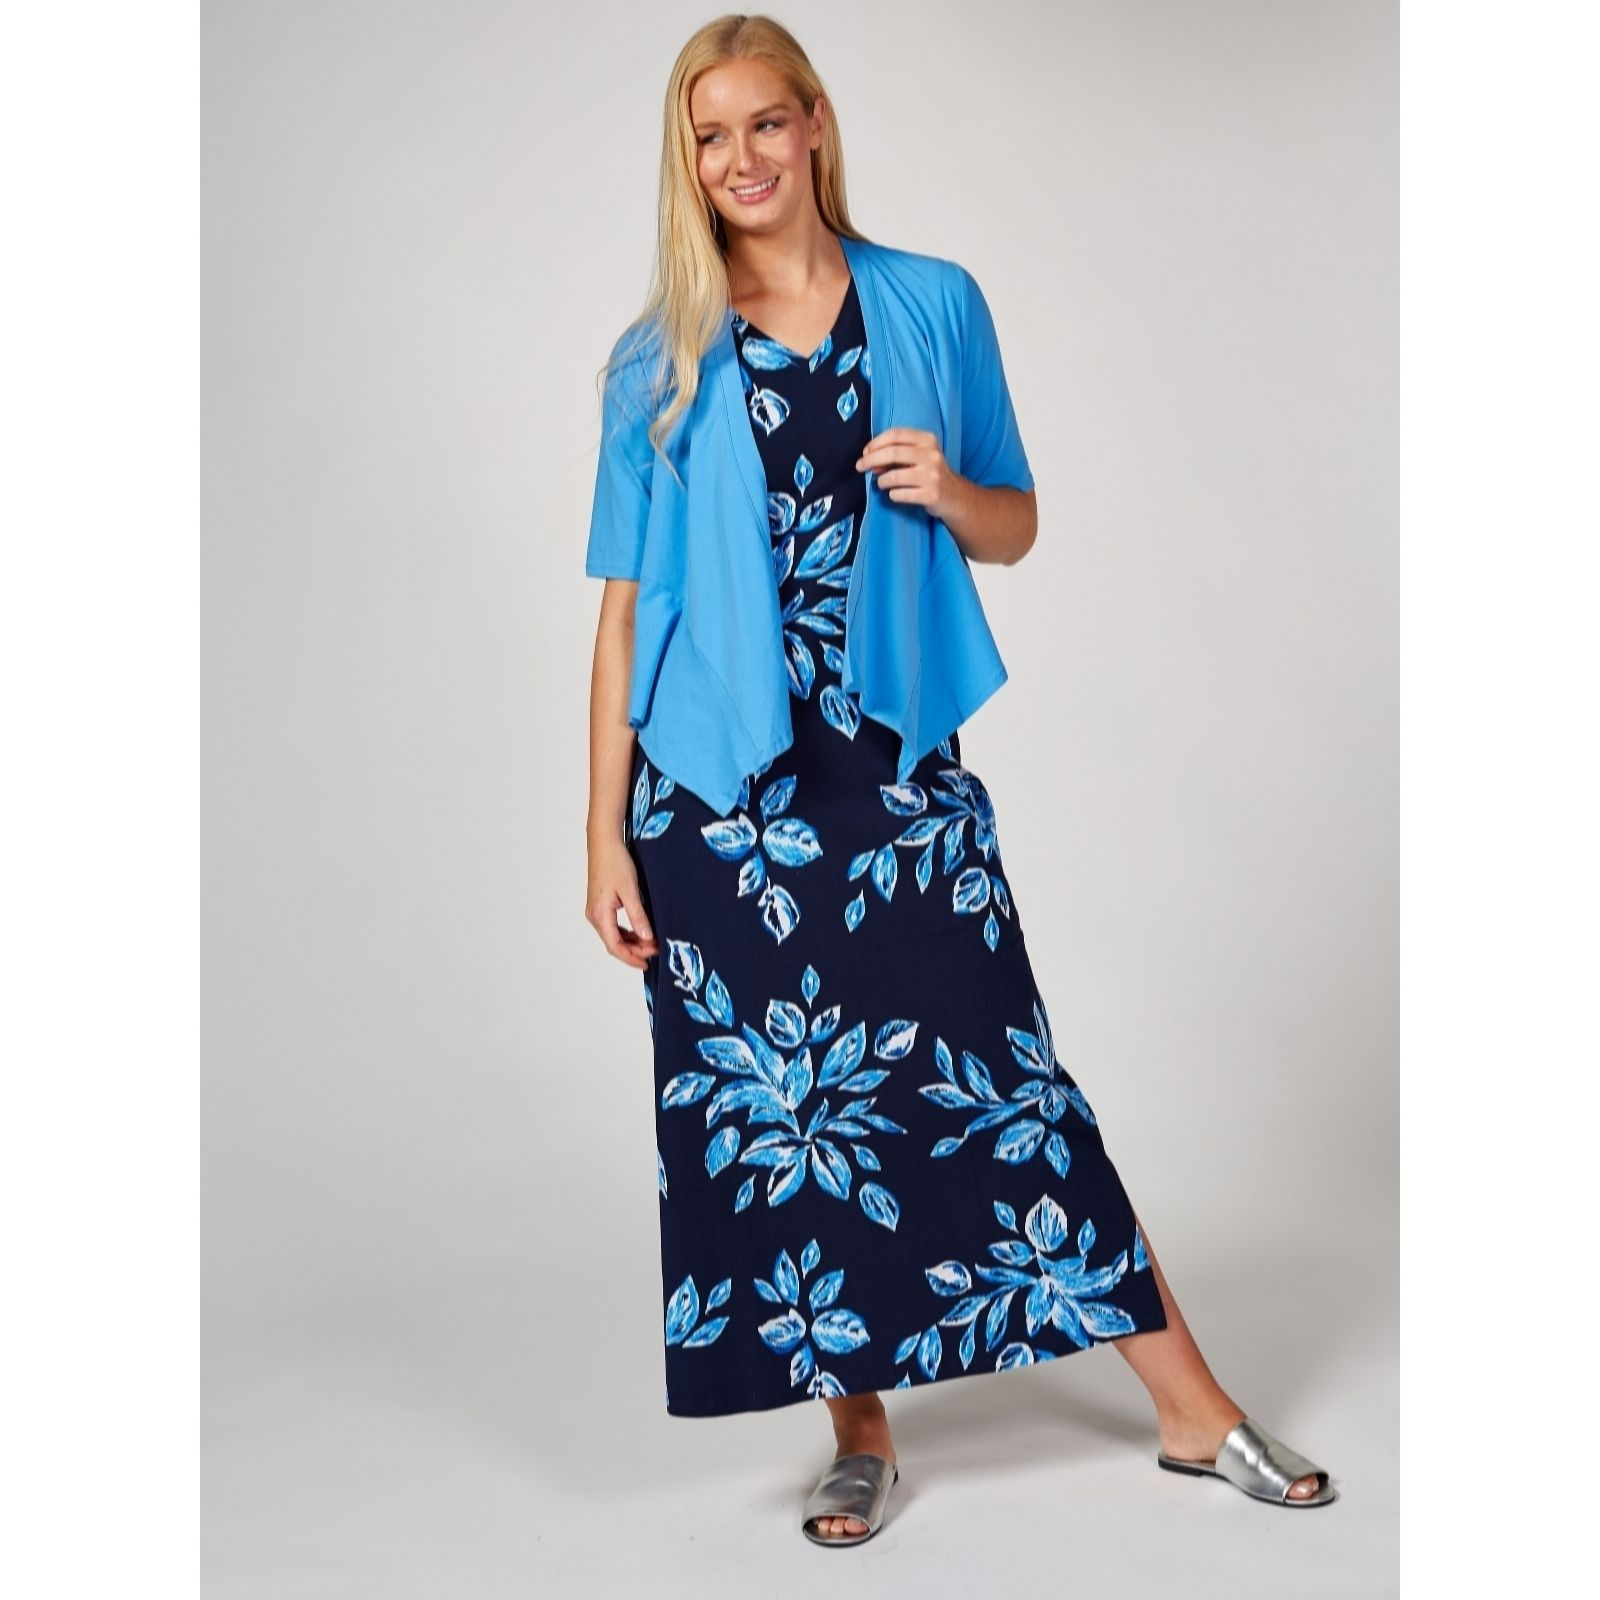 229d8c27fd3 Denim   Co. Cotton Jersey Maxi Dress   Waterfall Cardigan Petite ...